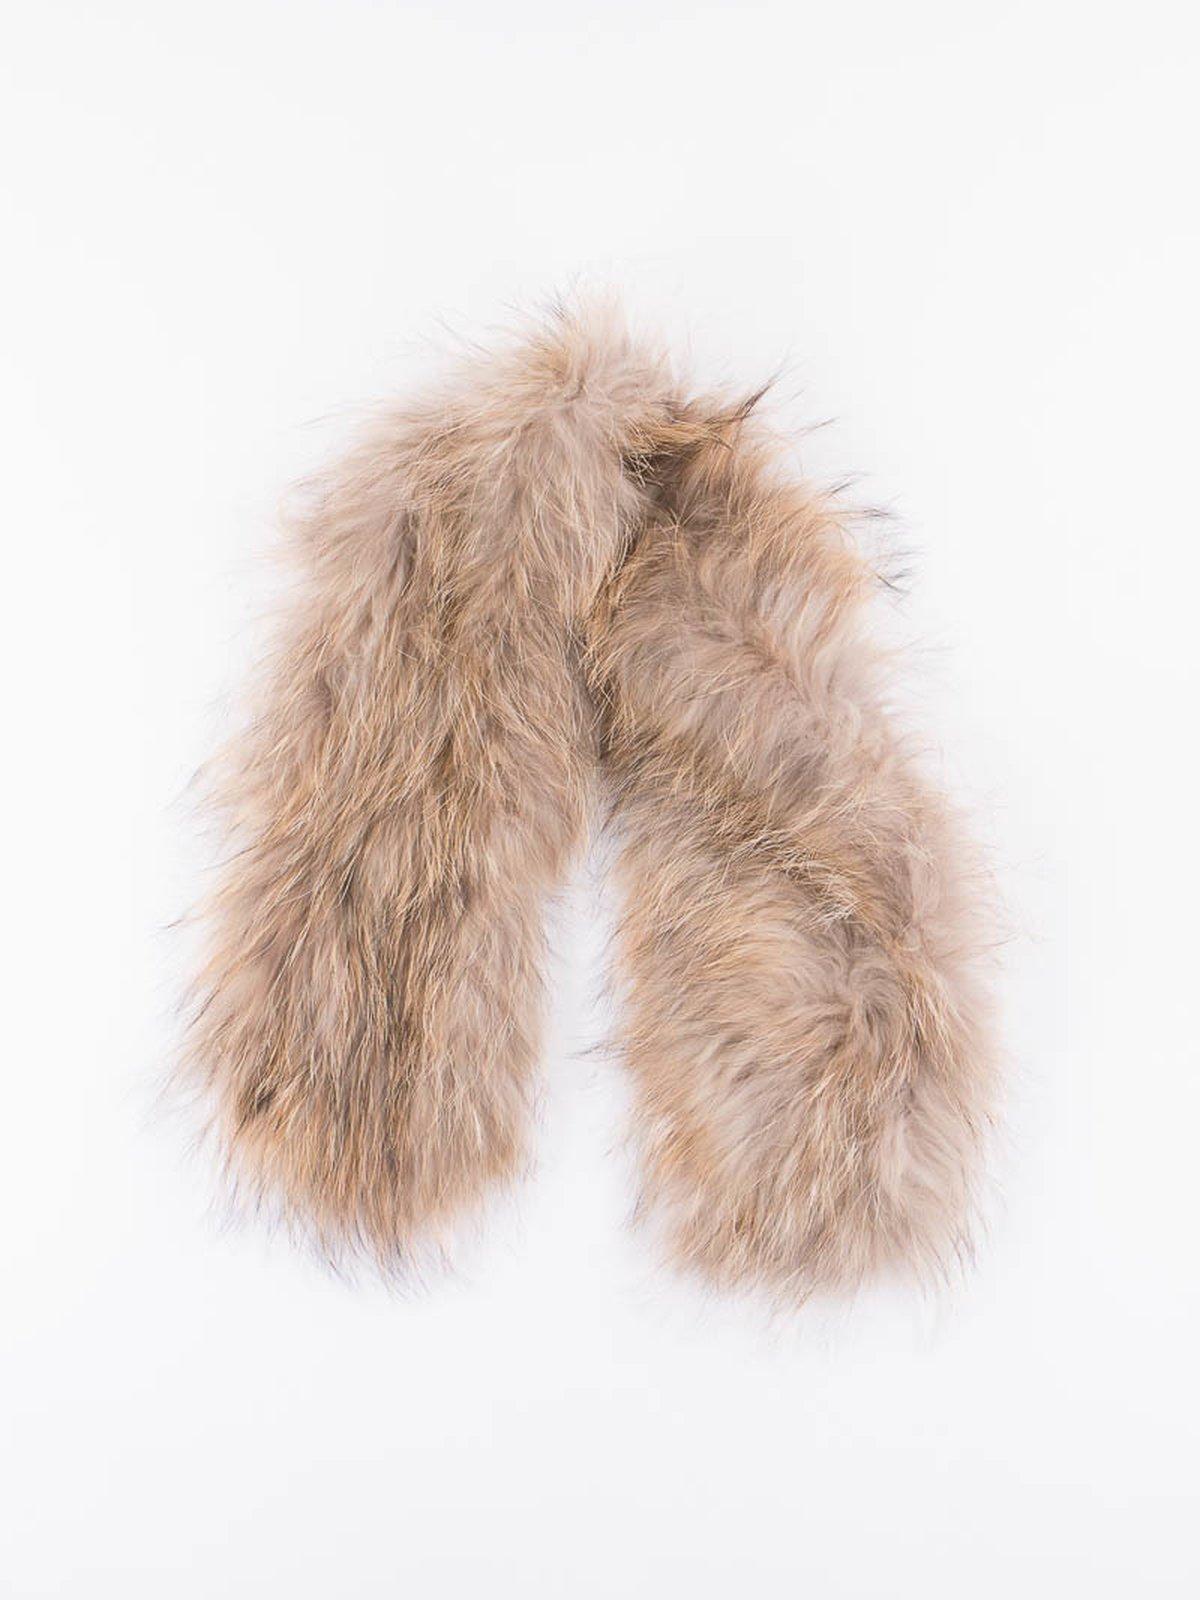 Gold Racoon Furling Coat Scarf - Image 1